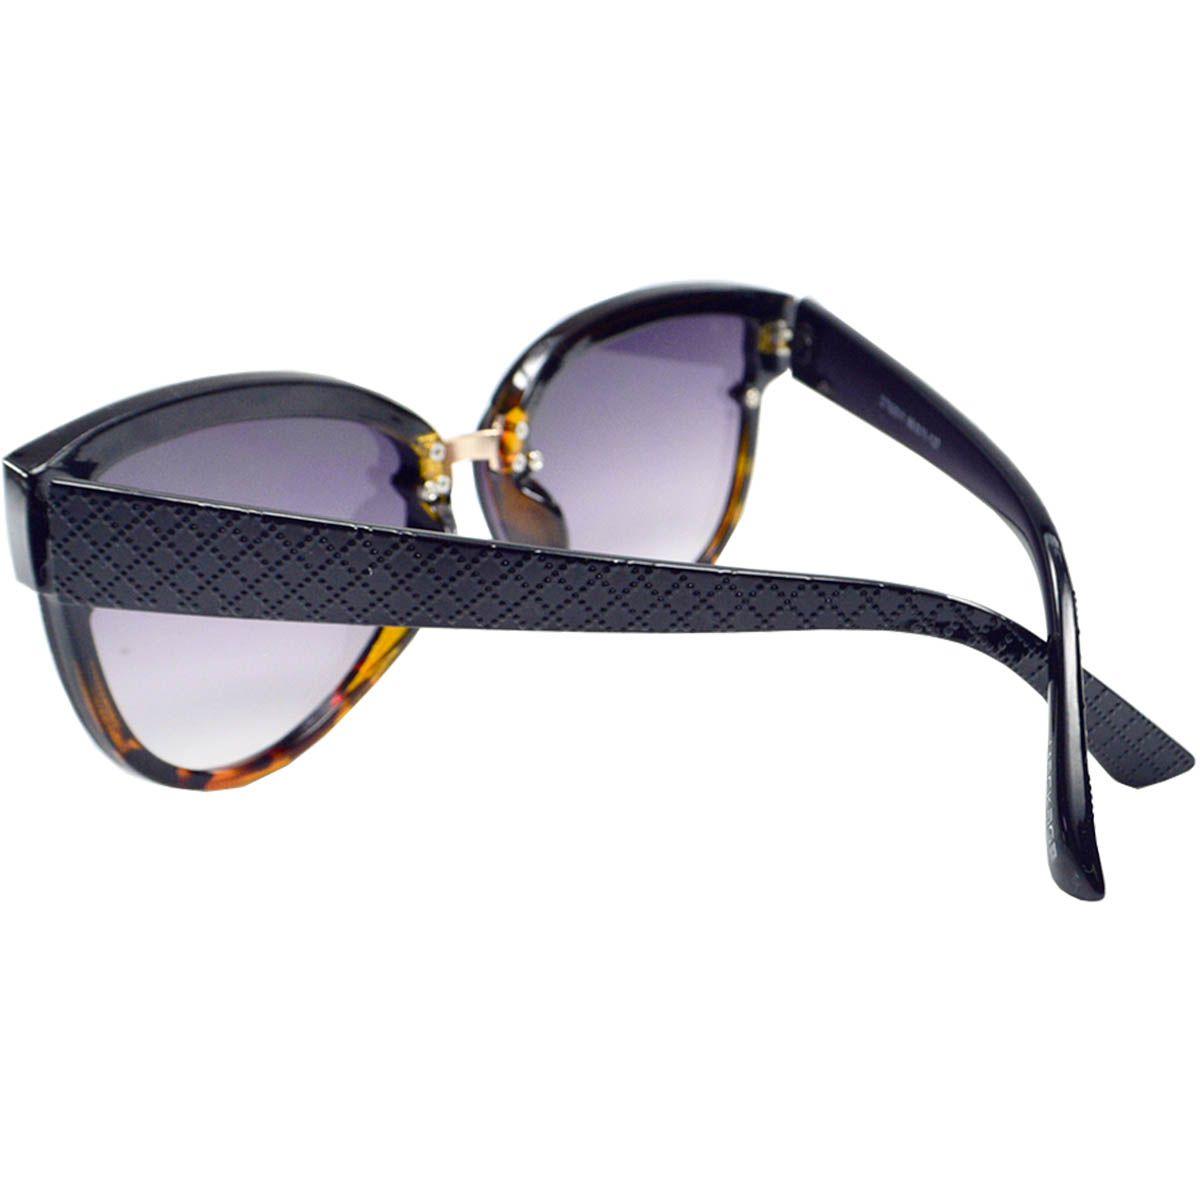 56d28c7f35b9e ... Óculos de Sol Feminino Mackage MK92011PT Preto Tarta - Mackage